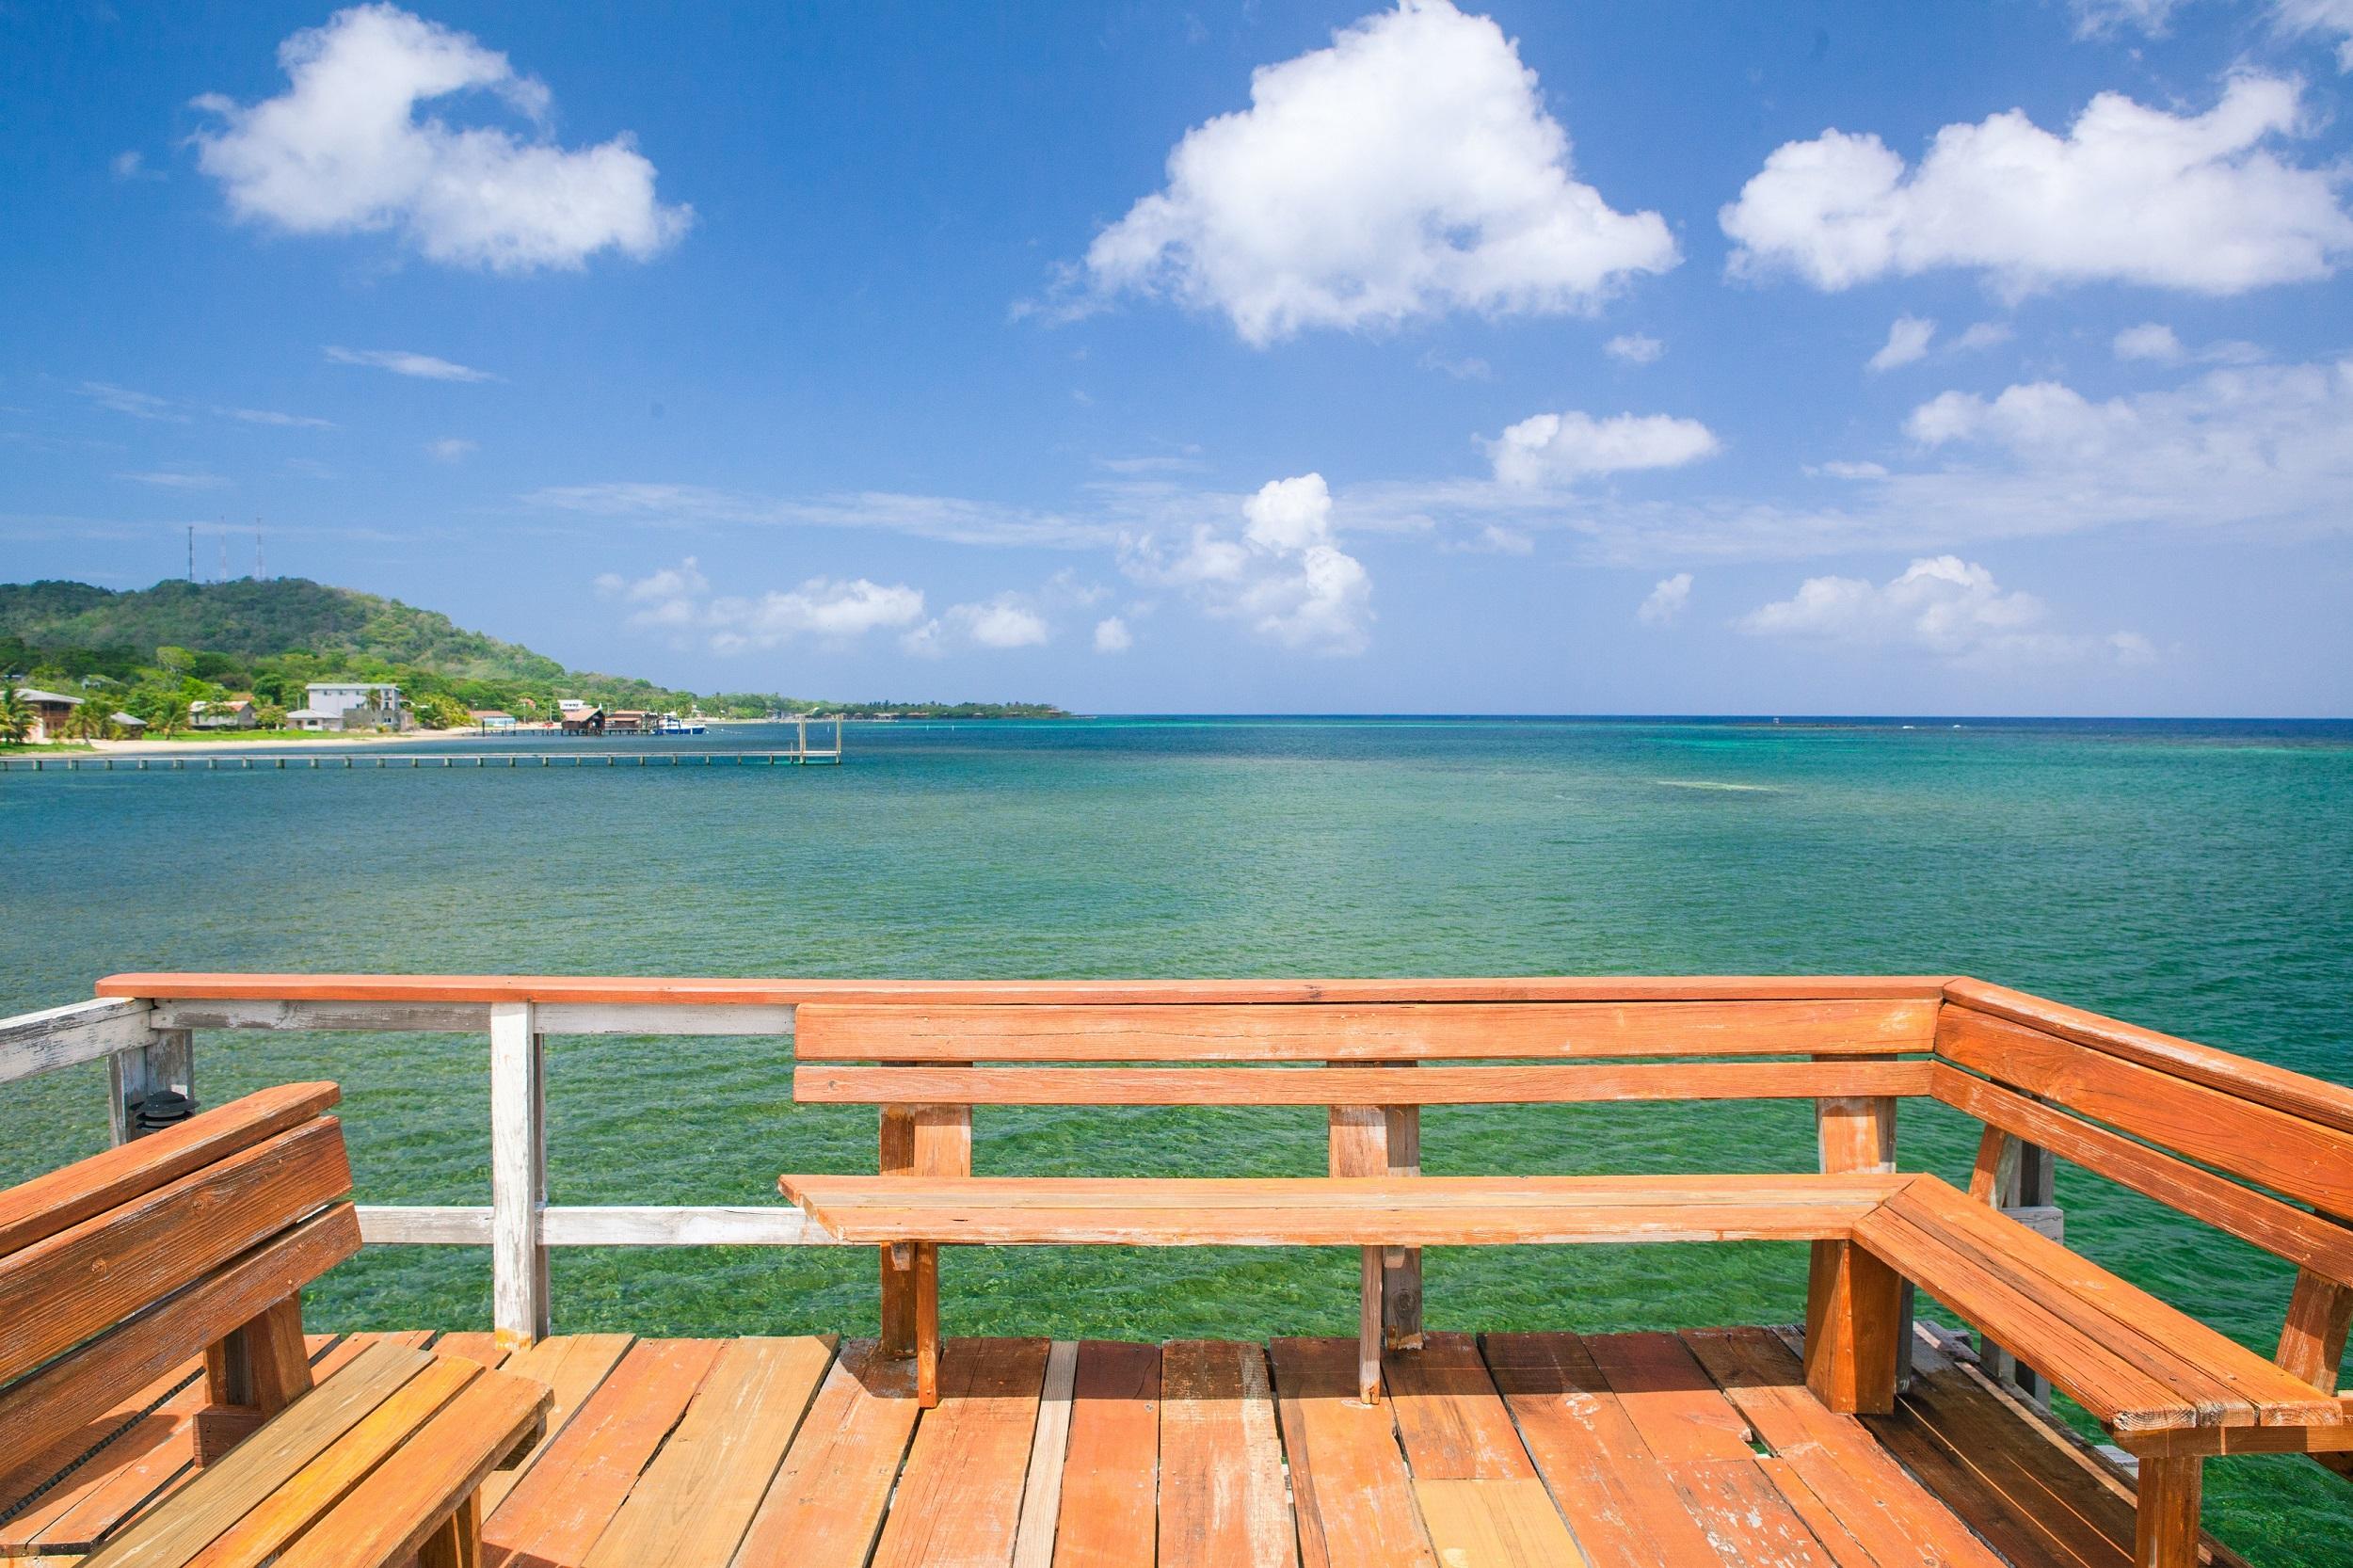 Sunnyside-Dock